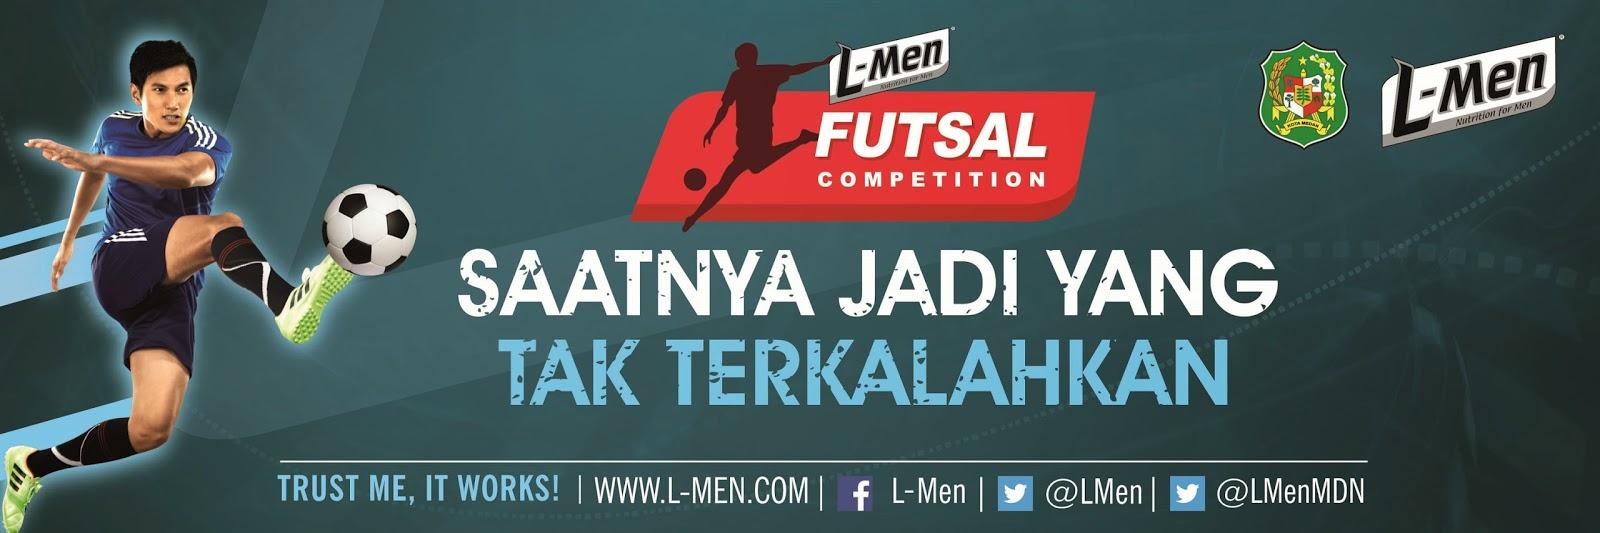 L Men Spanduk Futsal%2BCompetition%2B2014%2BMedan%2B %2BLINK%2BBO 140724